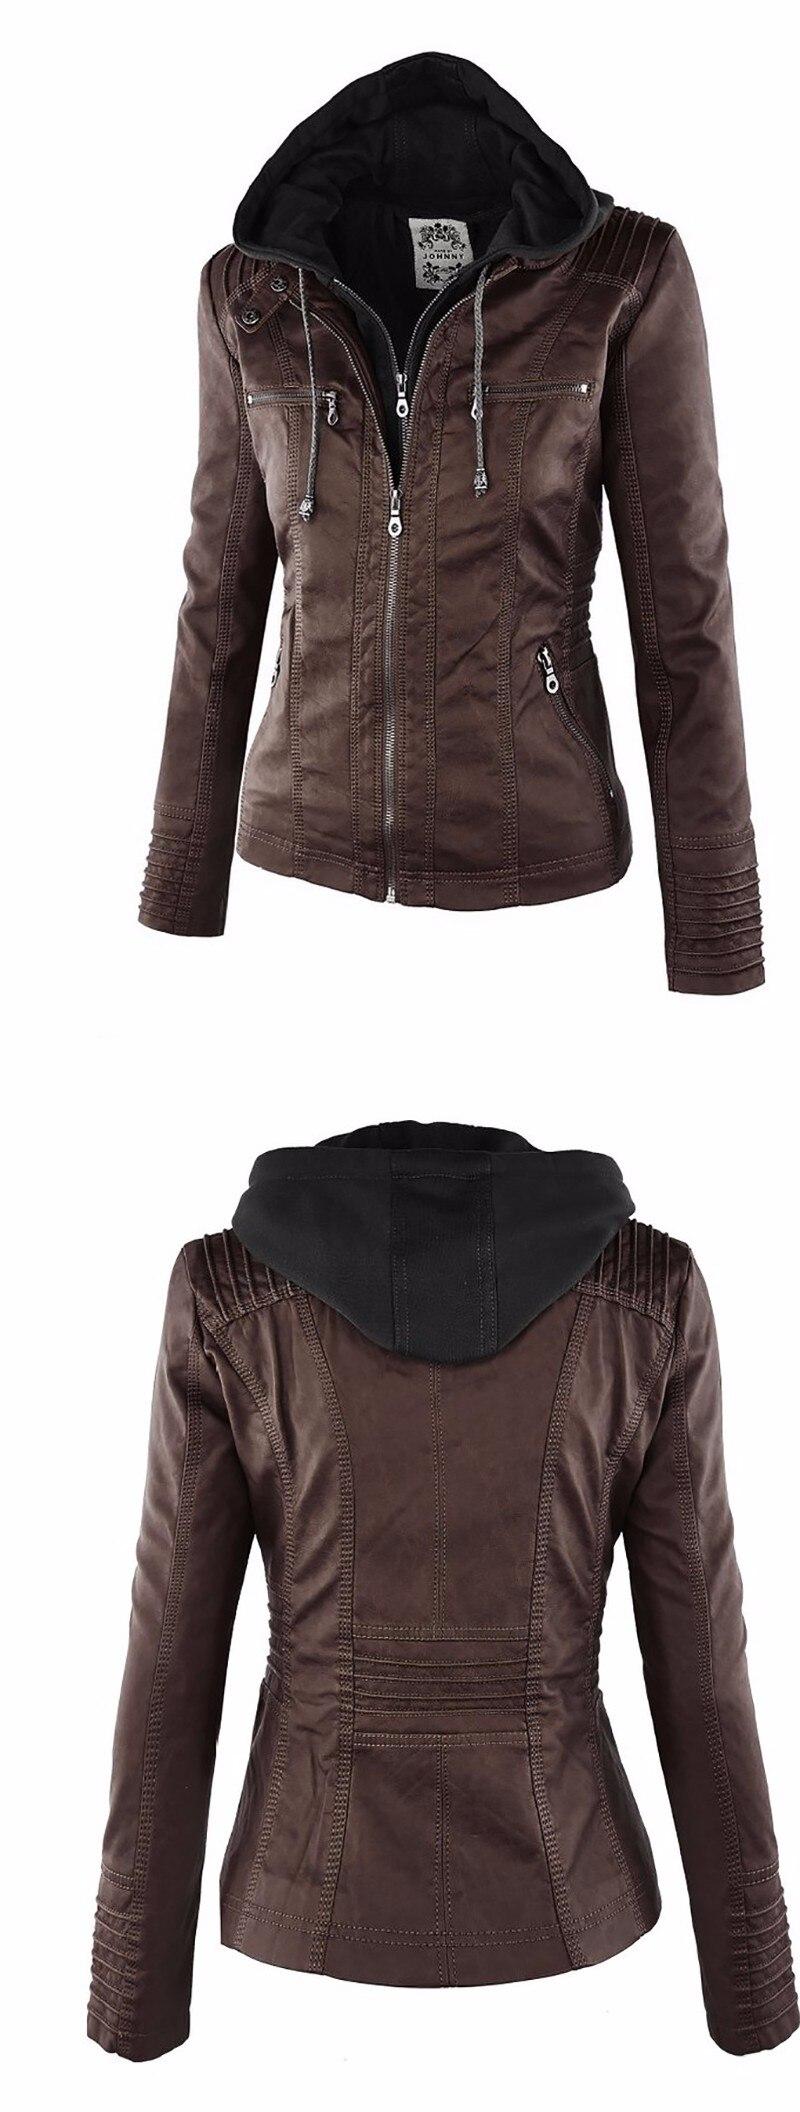 2018 Winter Faux Leather Jacket Women Casual Basic Coats Plus Size 7XL Ladies Basic Jackets Waterproof Windproof Coats Female 50